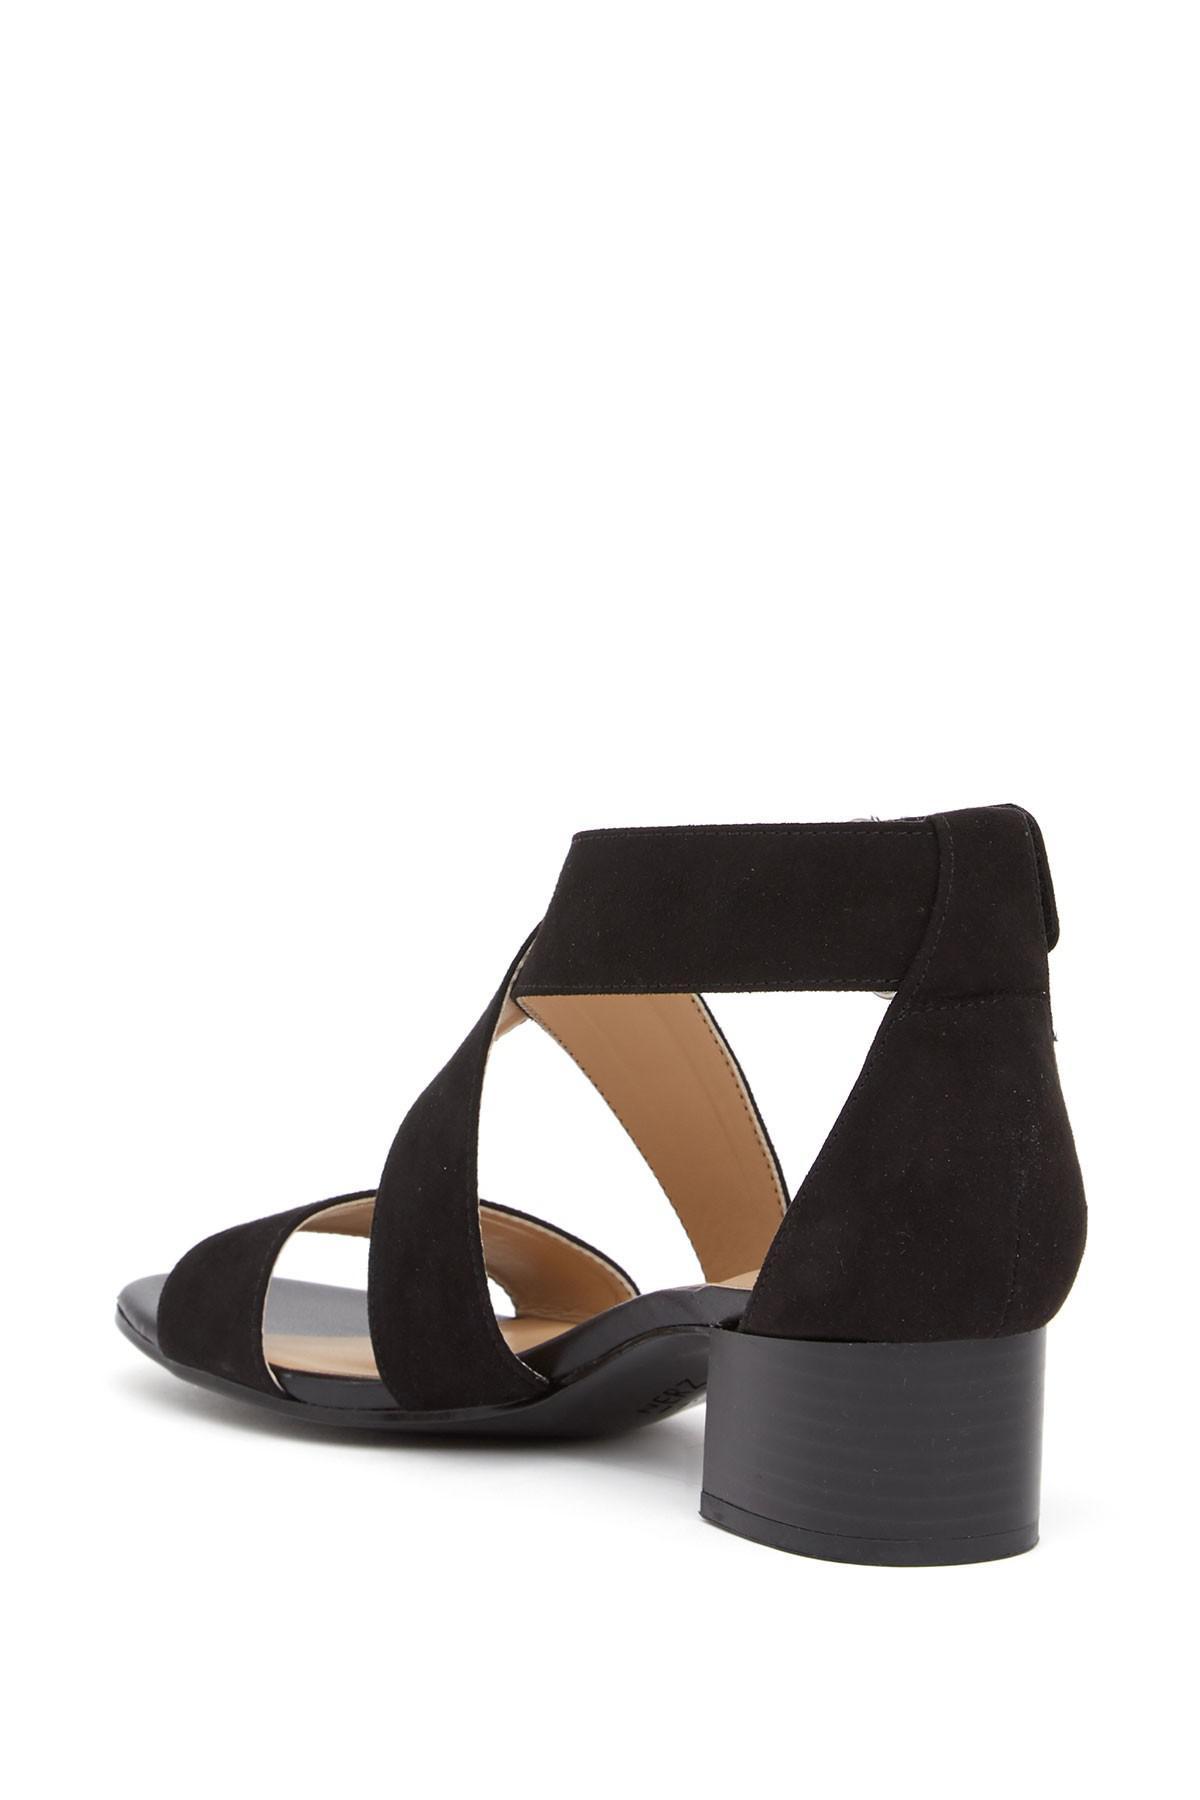 9fc95e8a30e0 Naturalizer - Black Adele Block Heel Sandal - Wide Width Available - Lyst.  View fullscreen